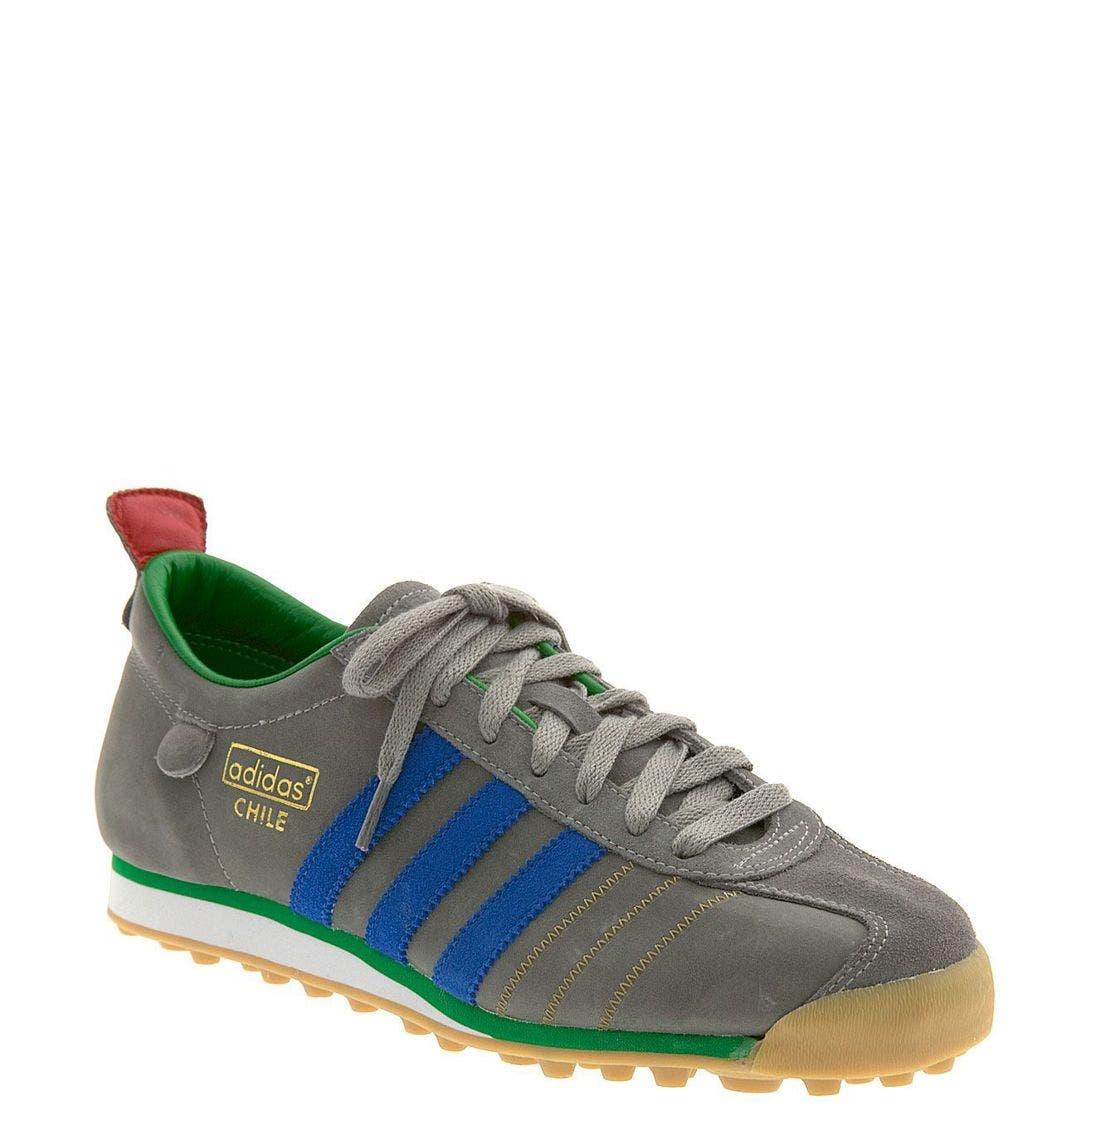 adidas chile scarpe da ginnastica